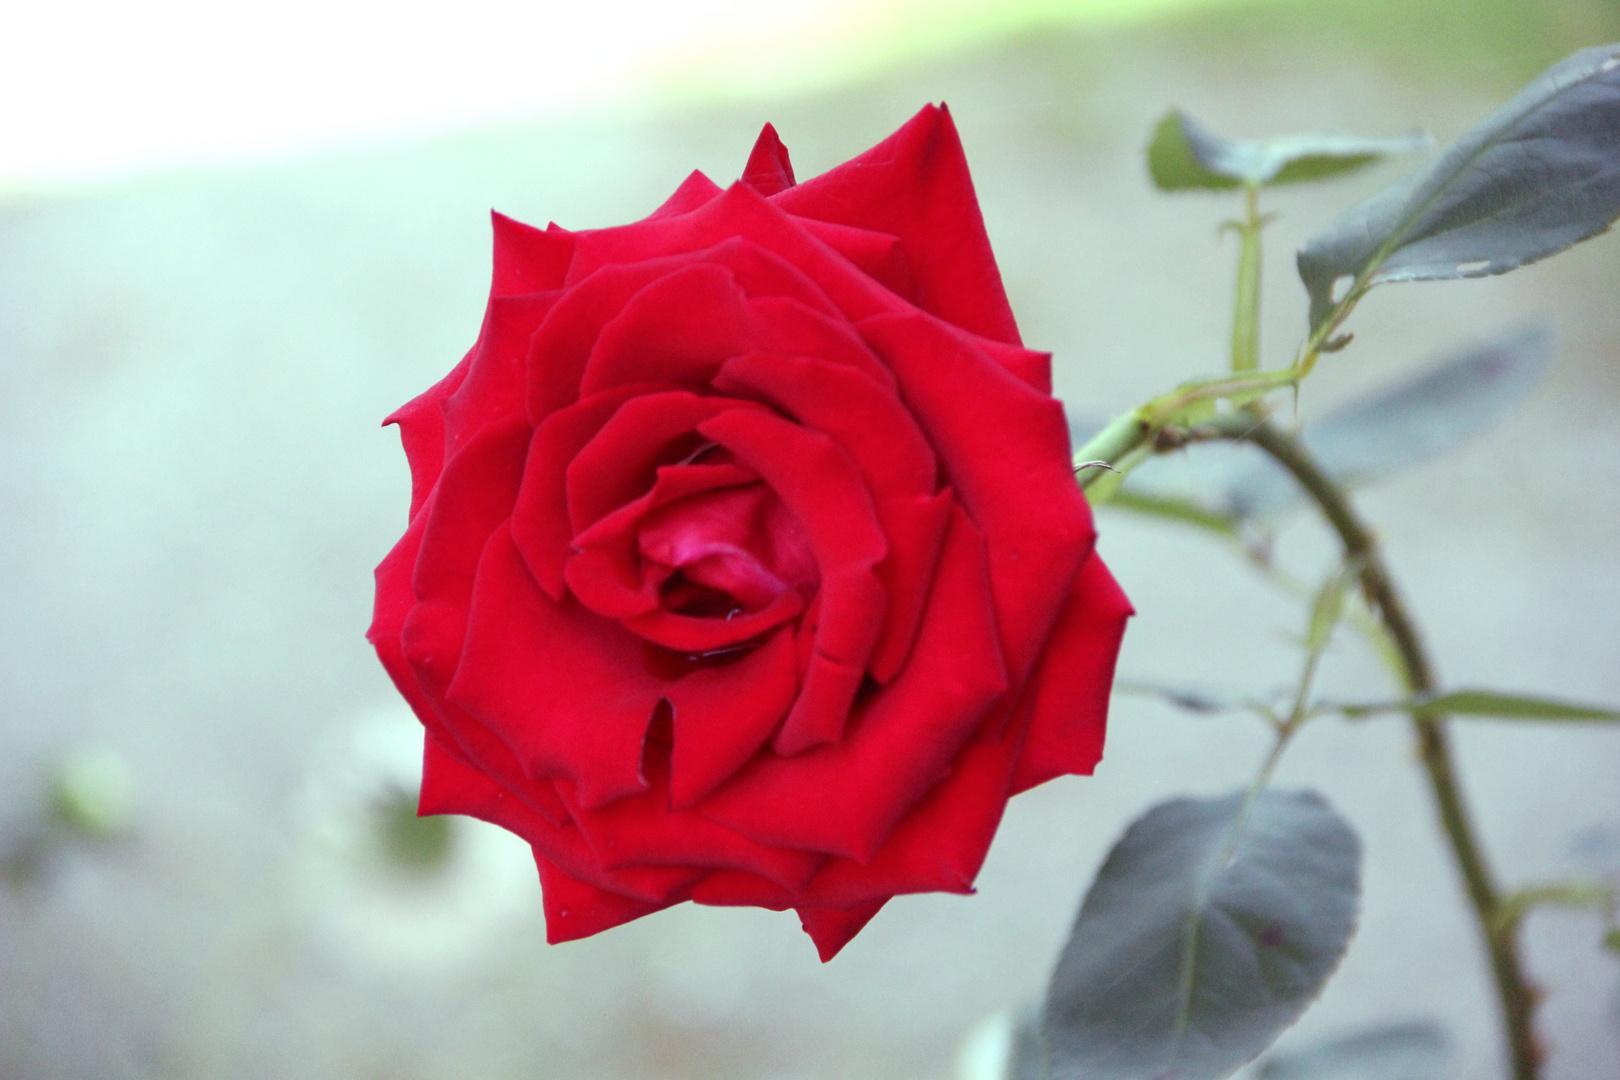 Tja, die klassische Rose - passt immer :)